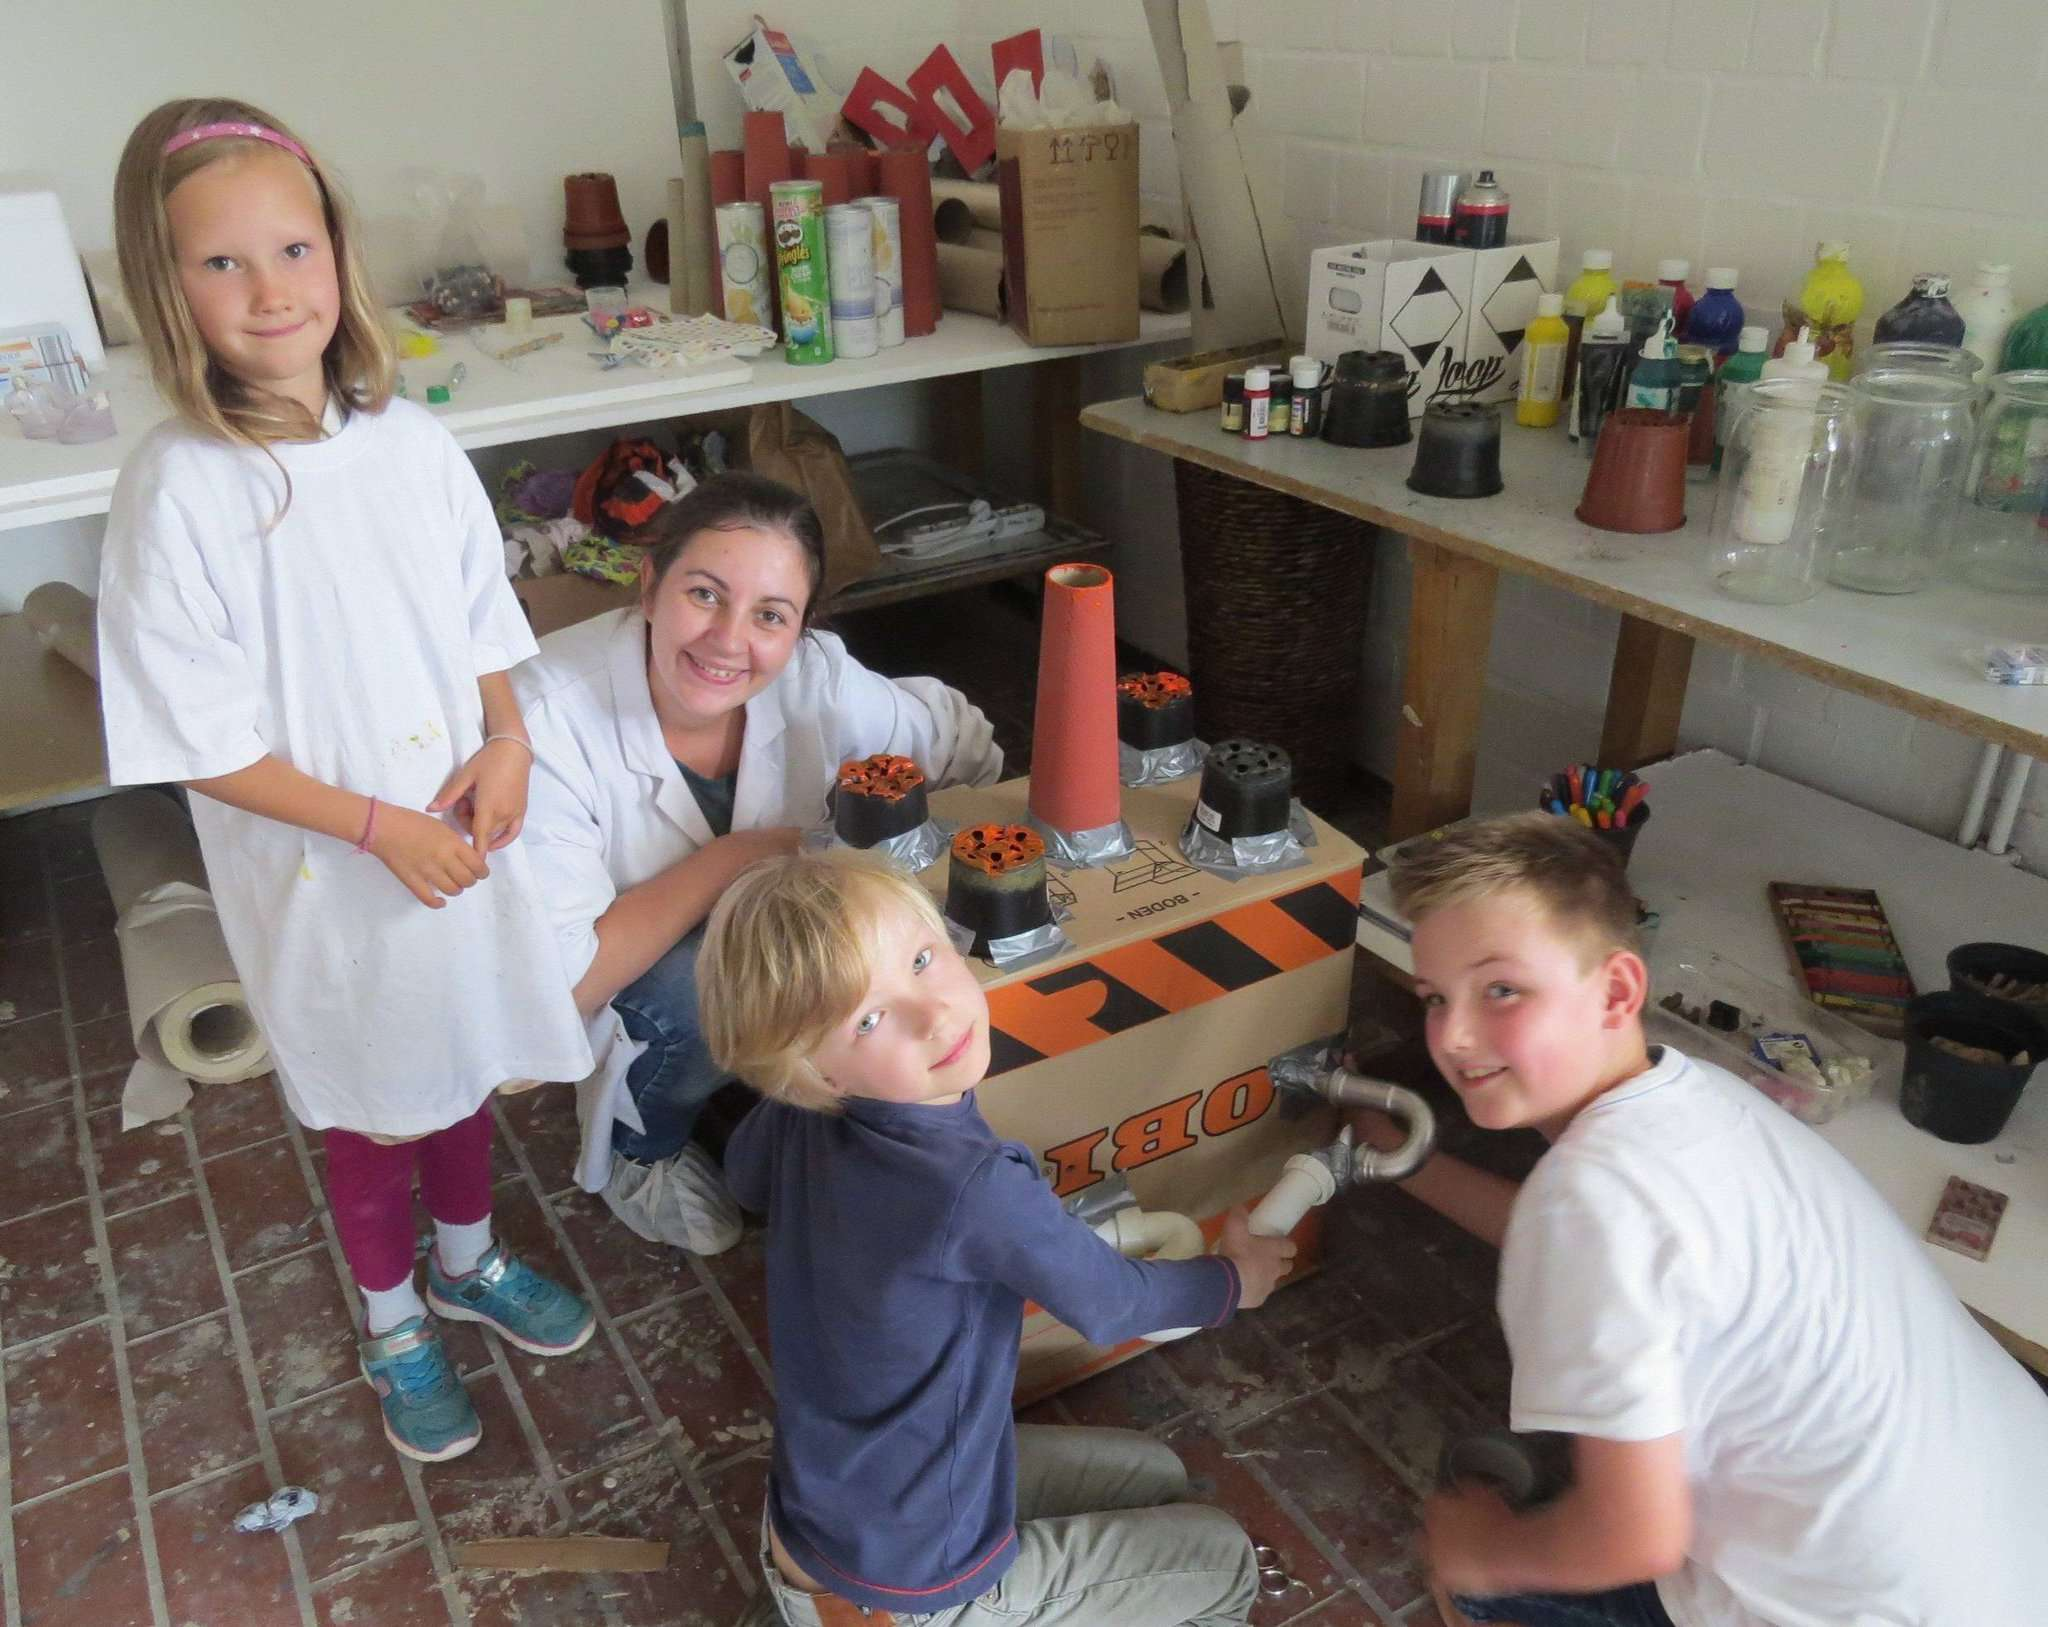 Der Kunstsommer der HKS Ottersberg bietet traditionell auch Kinderkurse an.  Foto: Elke Keppler-Rosenau